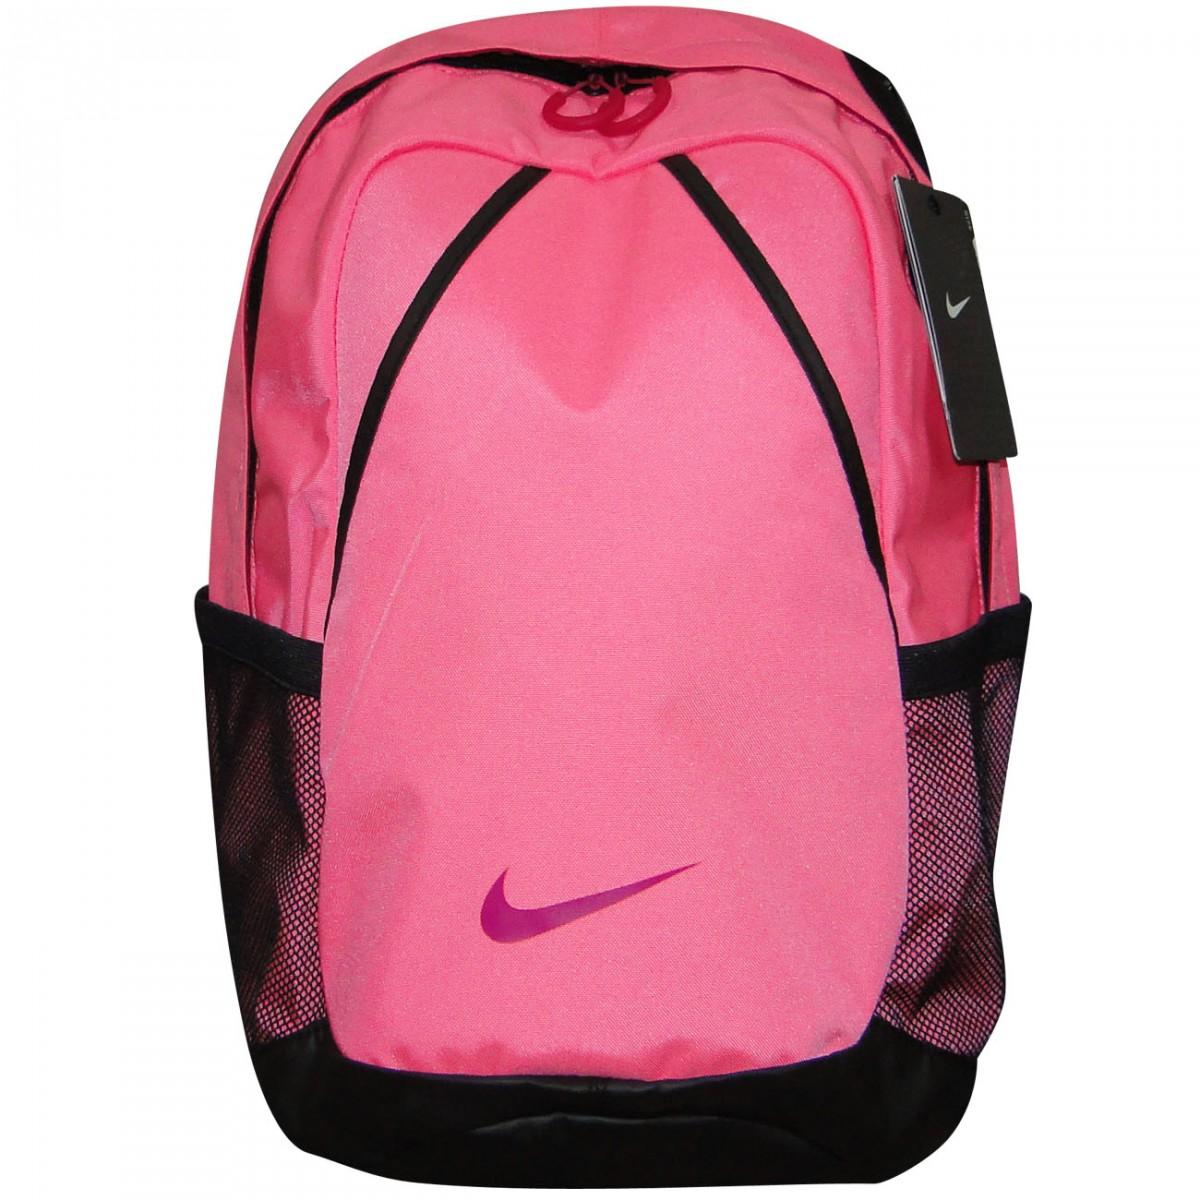 455cbee6a Mochila Nike BA4731 4731-653 - Rosa/Preto - Chuteira Nike, Adidas ...